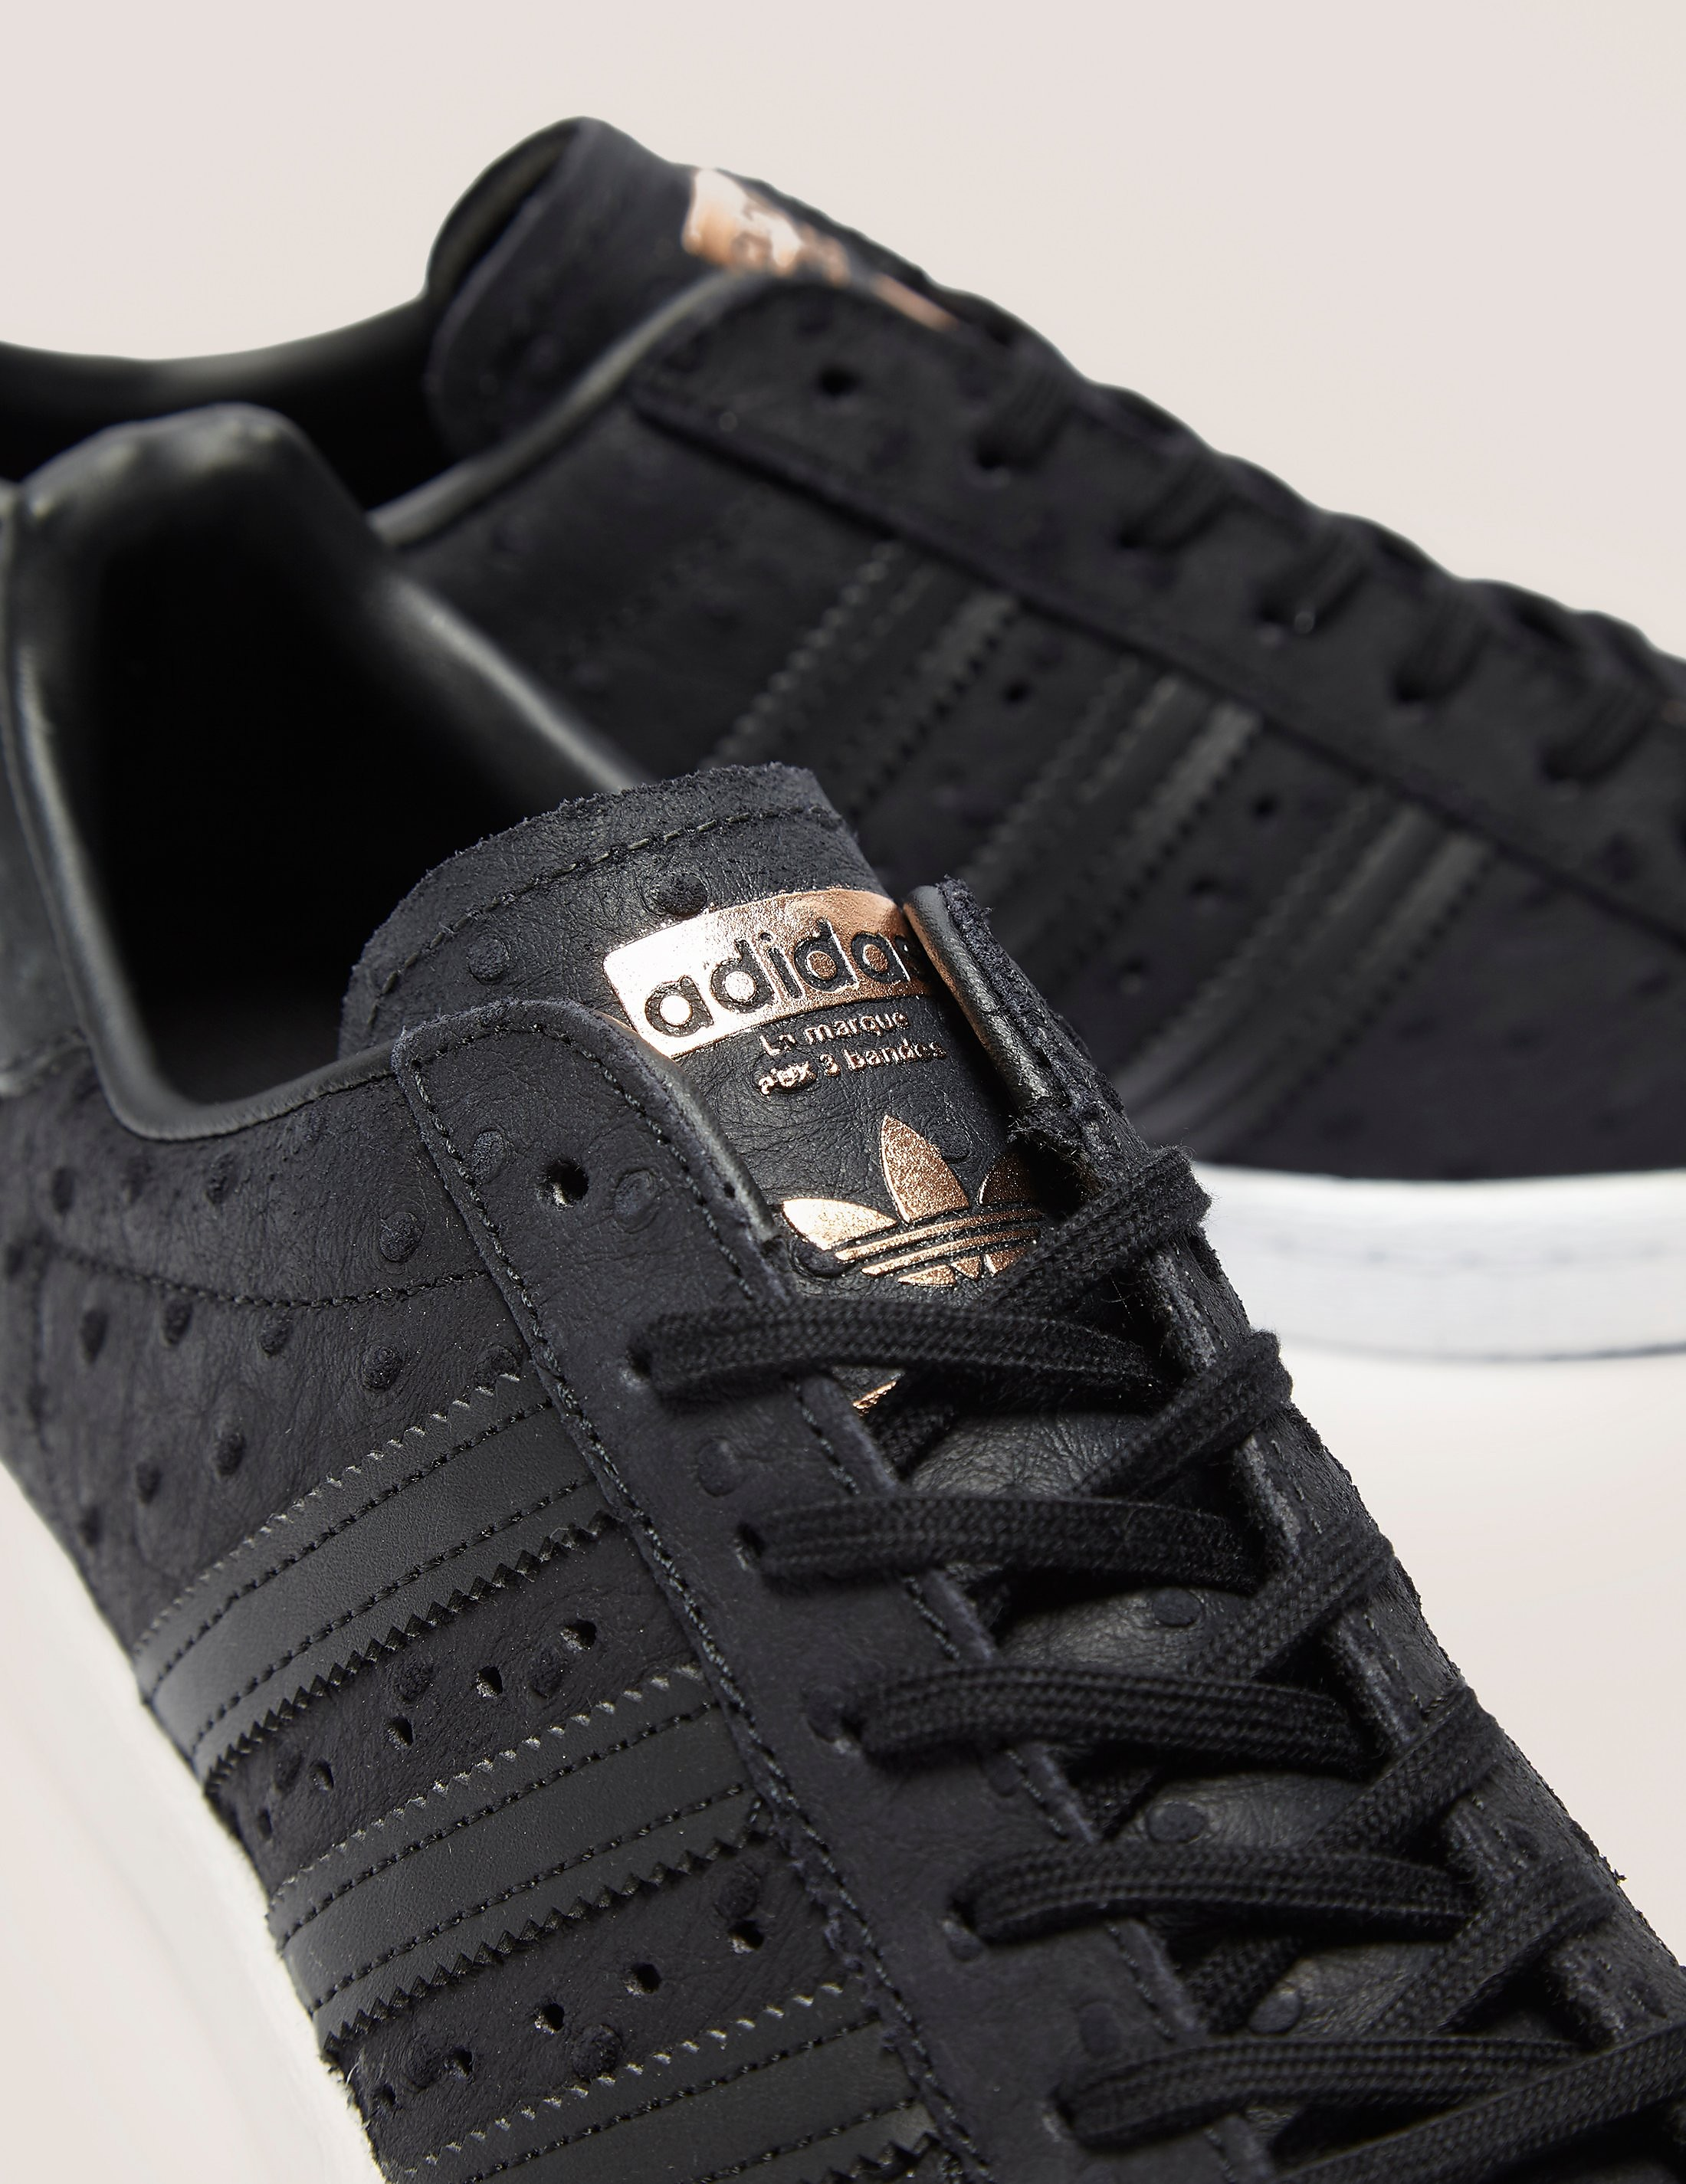 adidas Originals Superstar 80s Women's